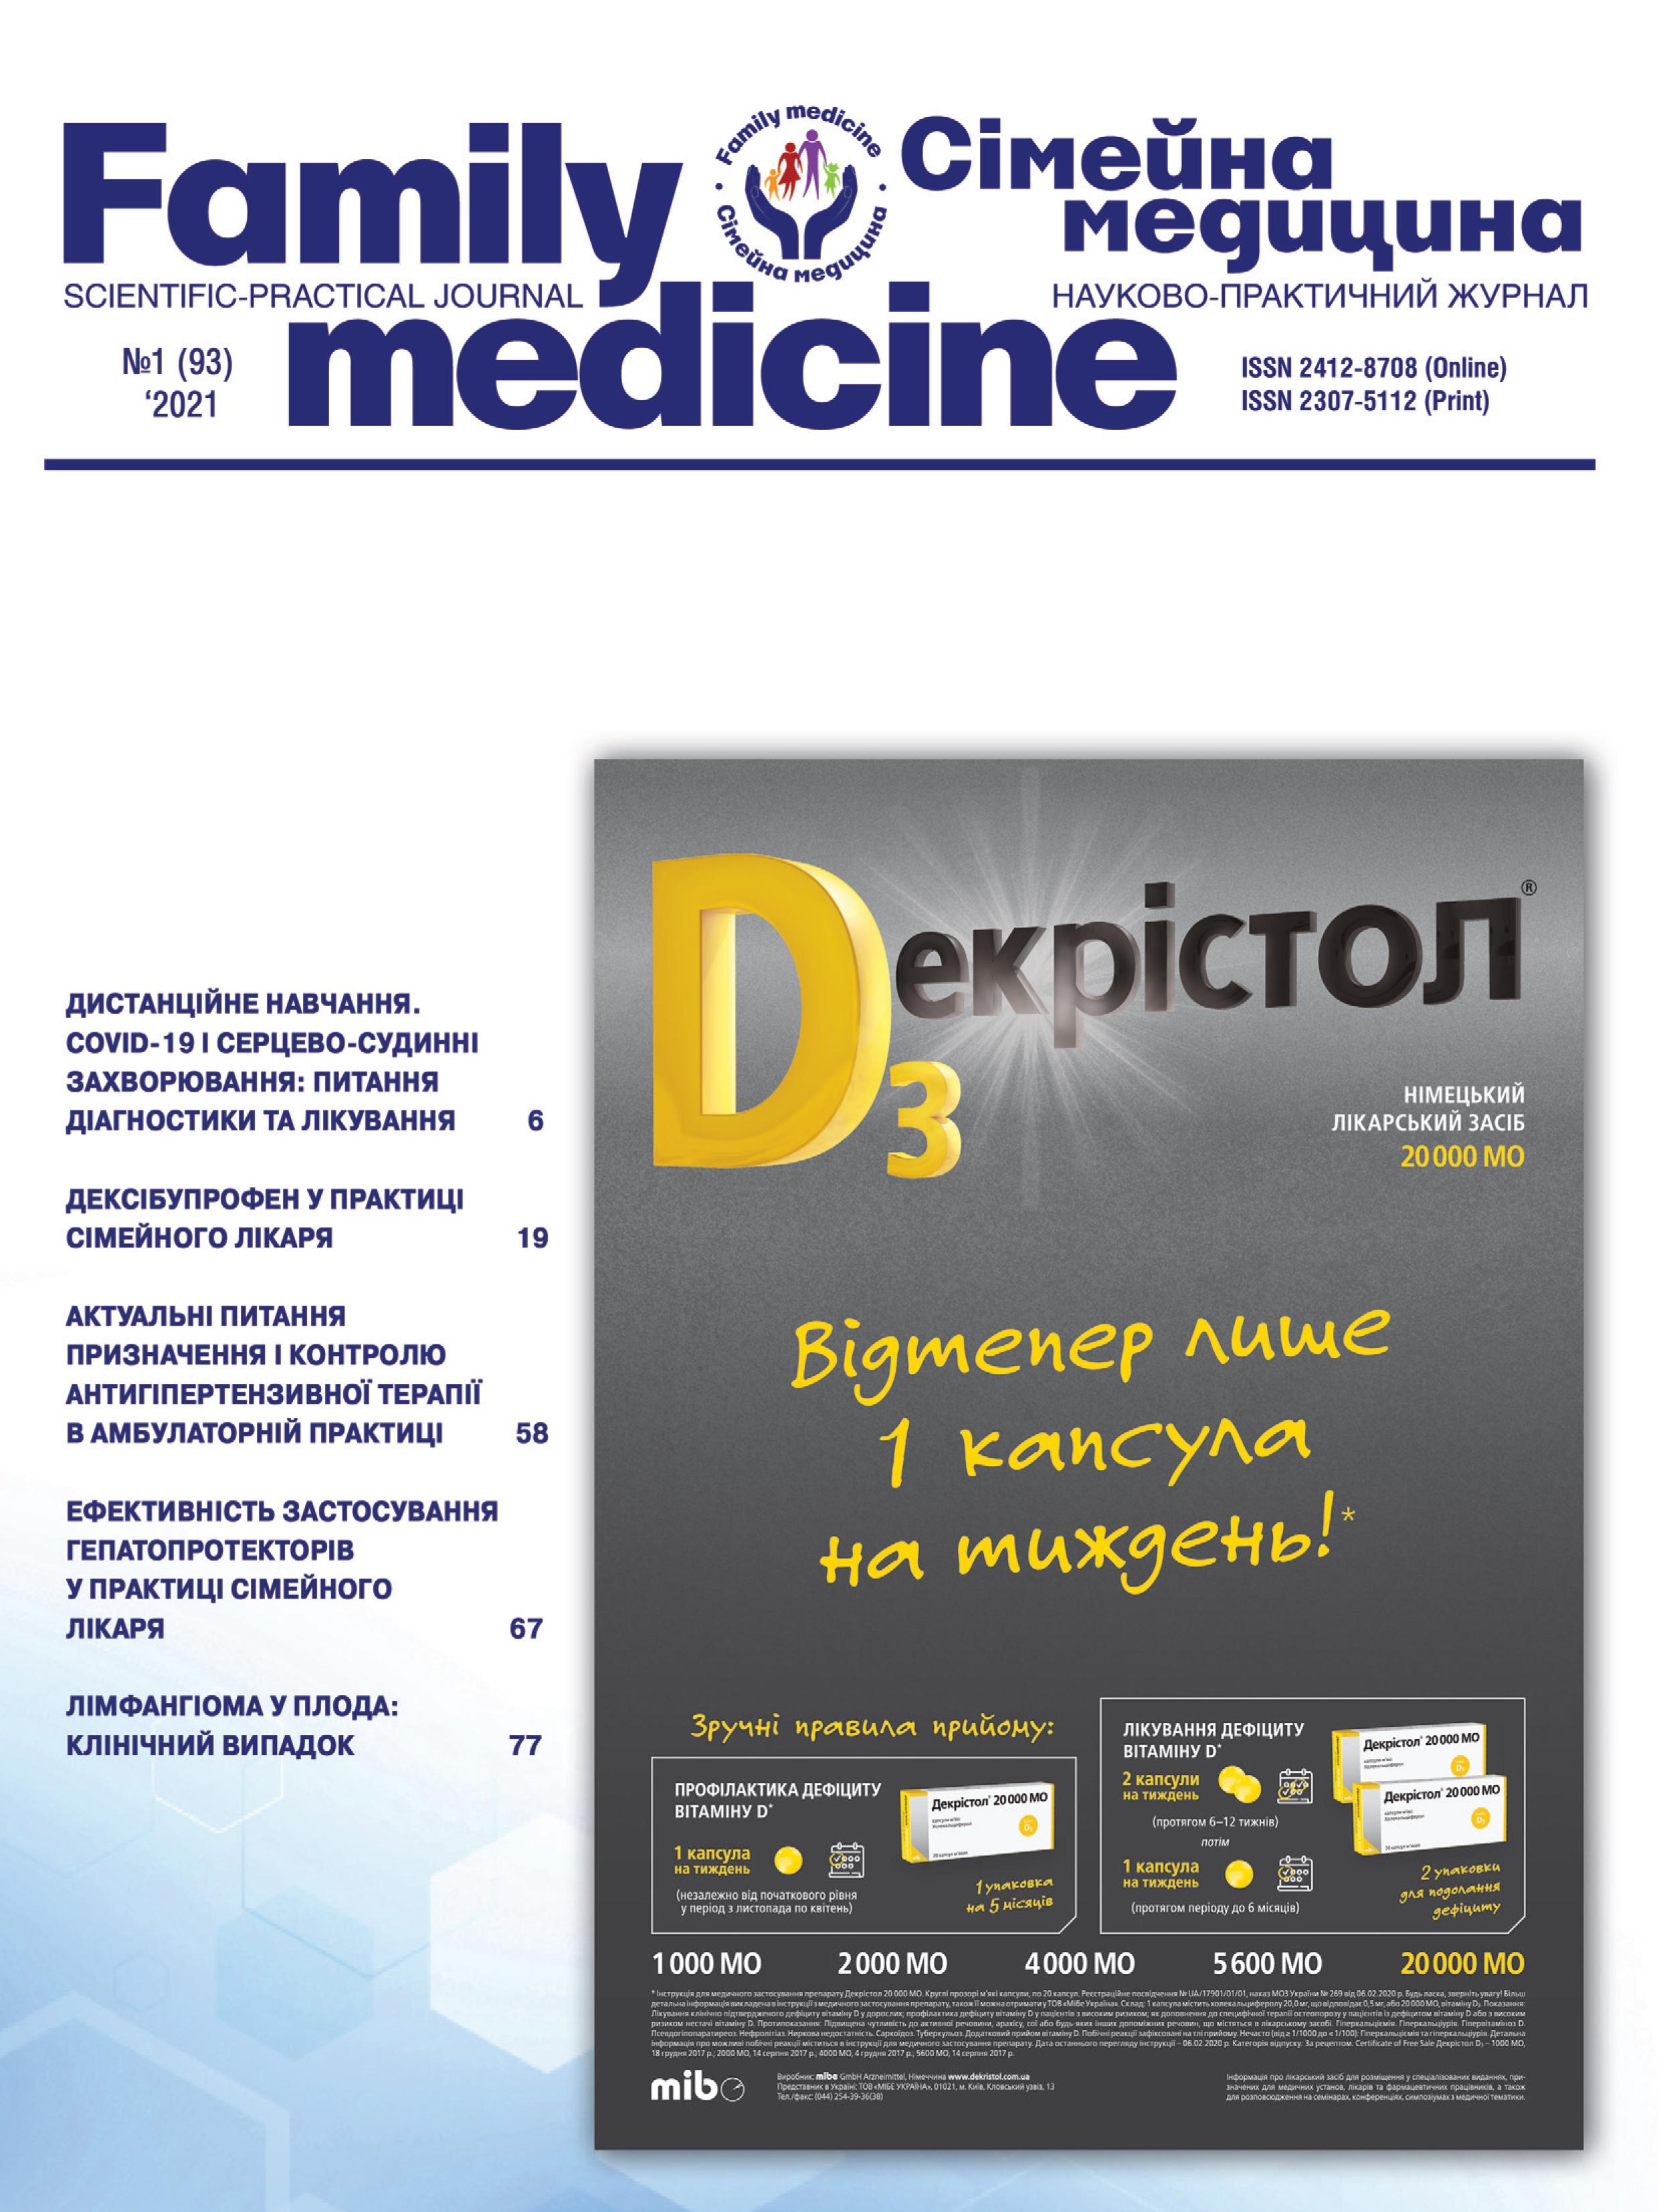 Сімейна медицина № 1 (2021)